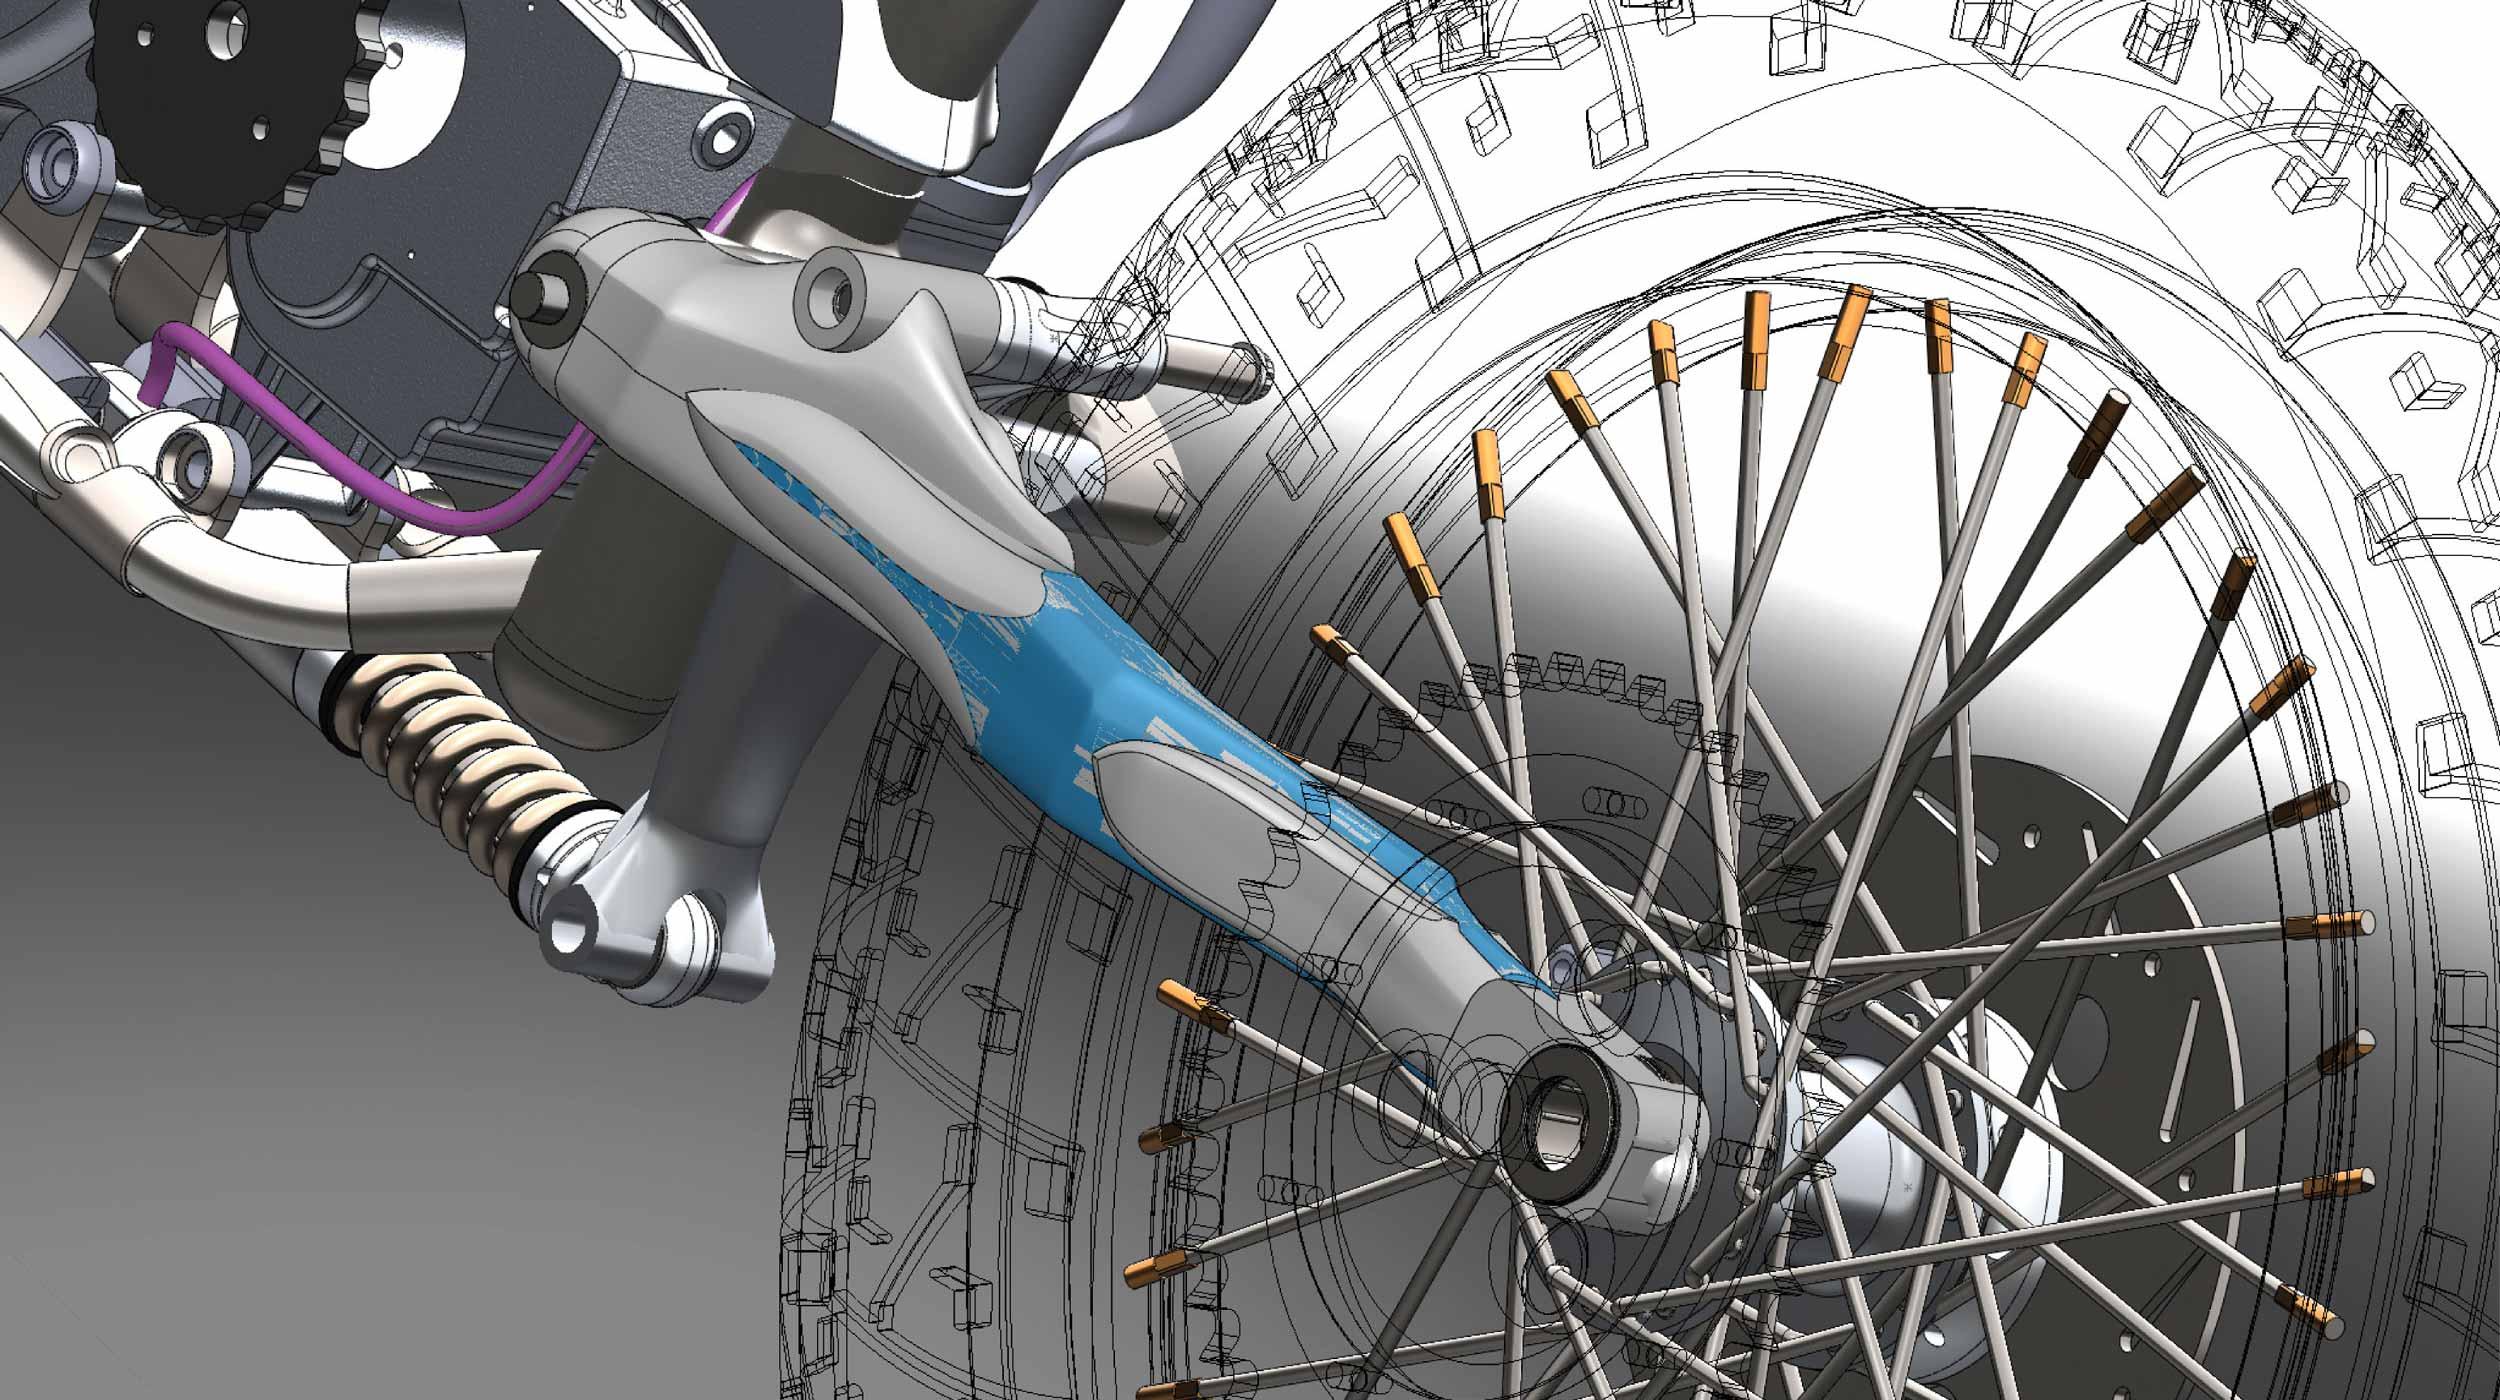 White-Rear-Rotor-Sproket-Wireframe.jpg